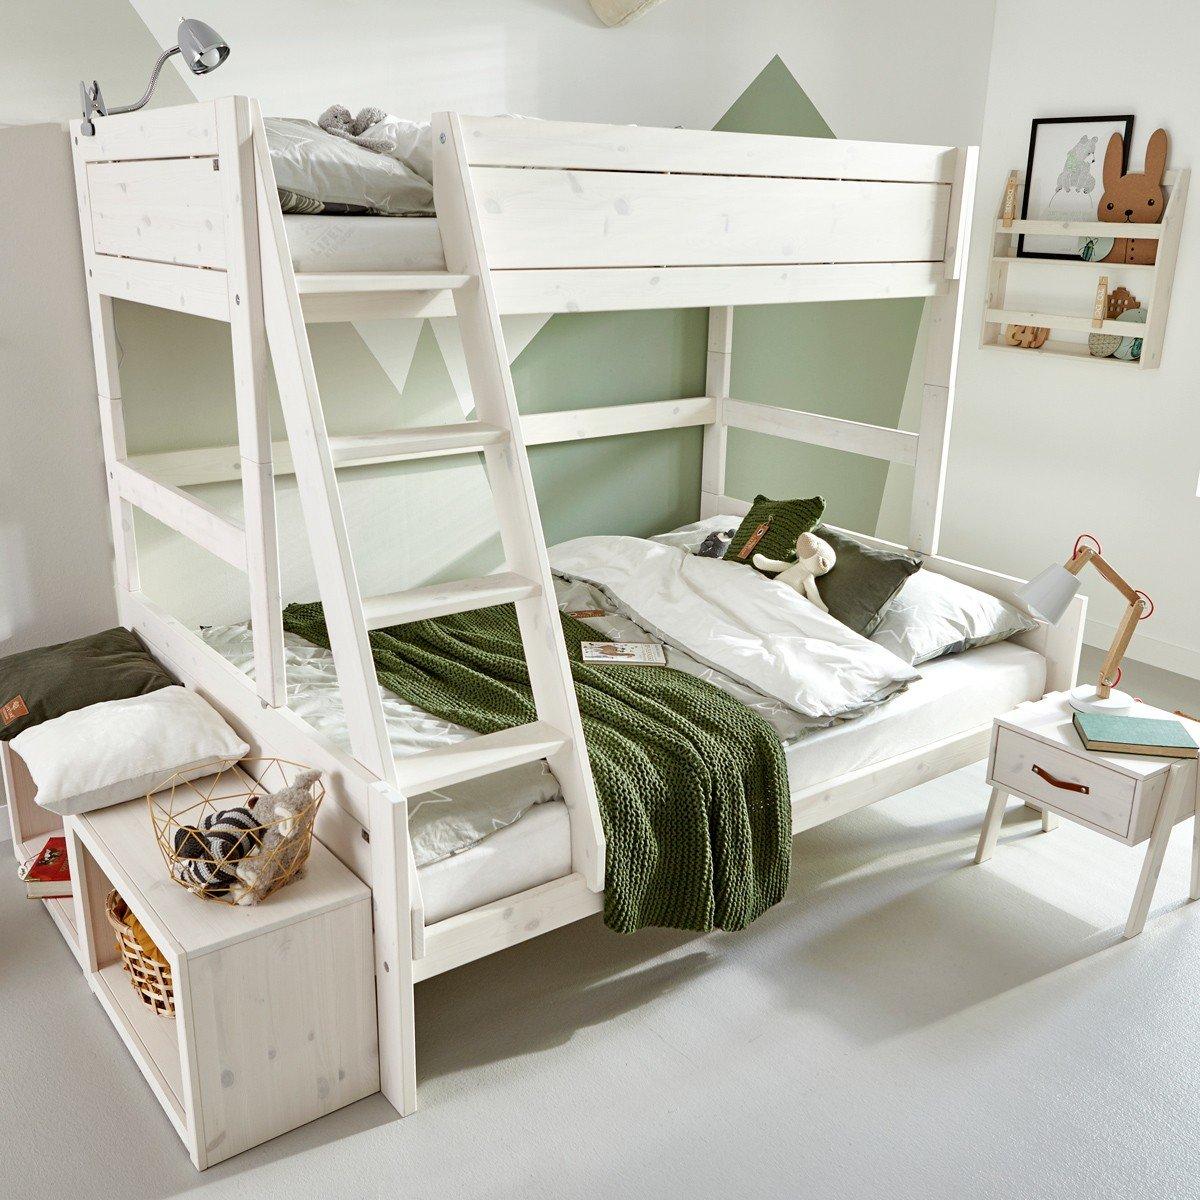 lifetime etagenbett family bed b 140 cm im wallenfels onlineshop, Hause deko